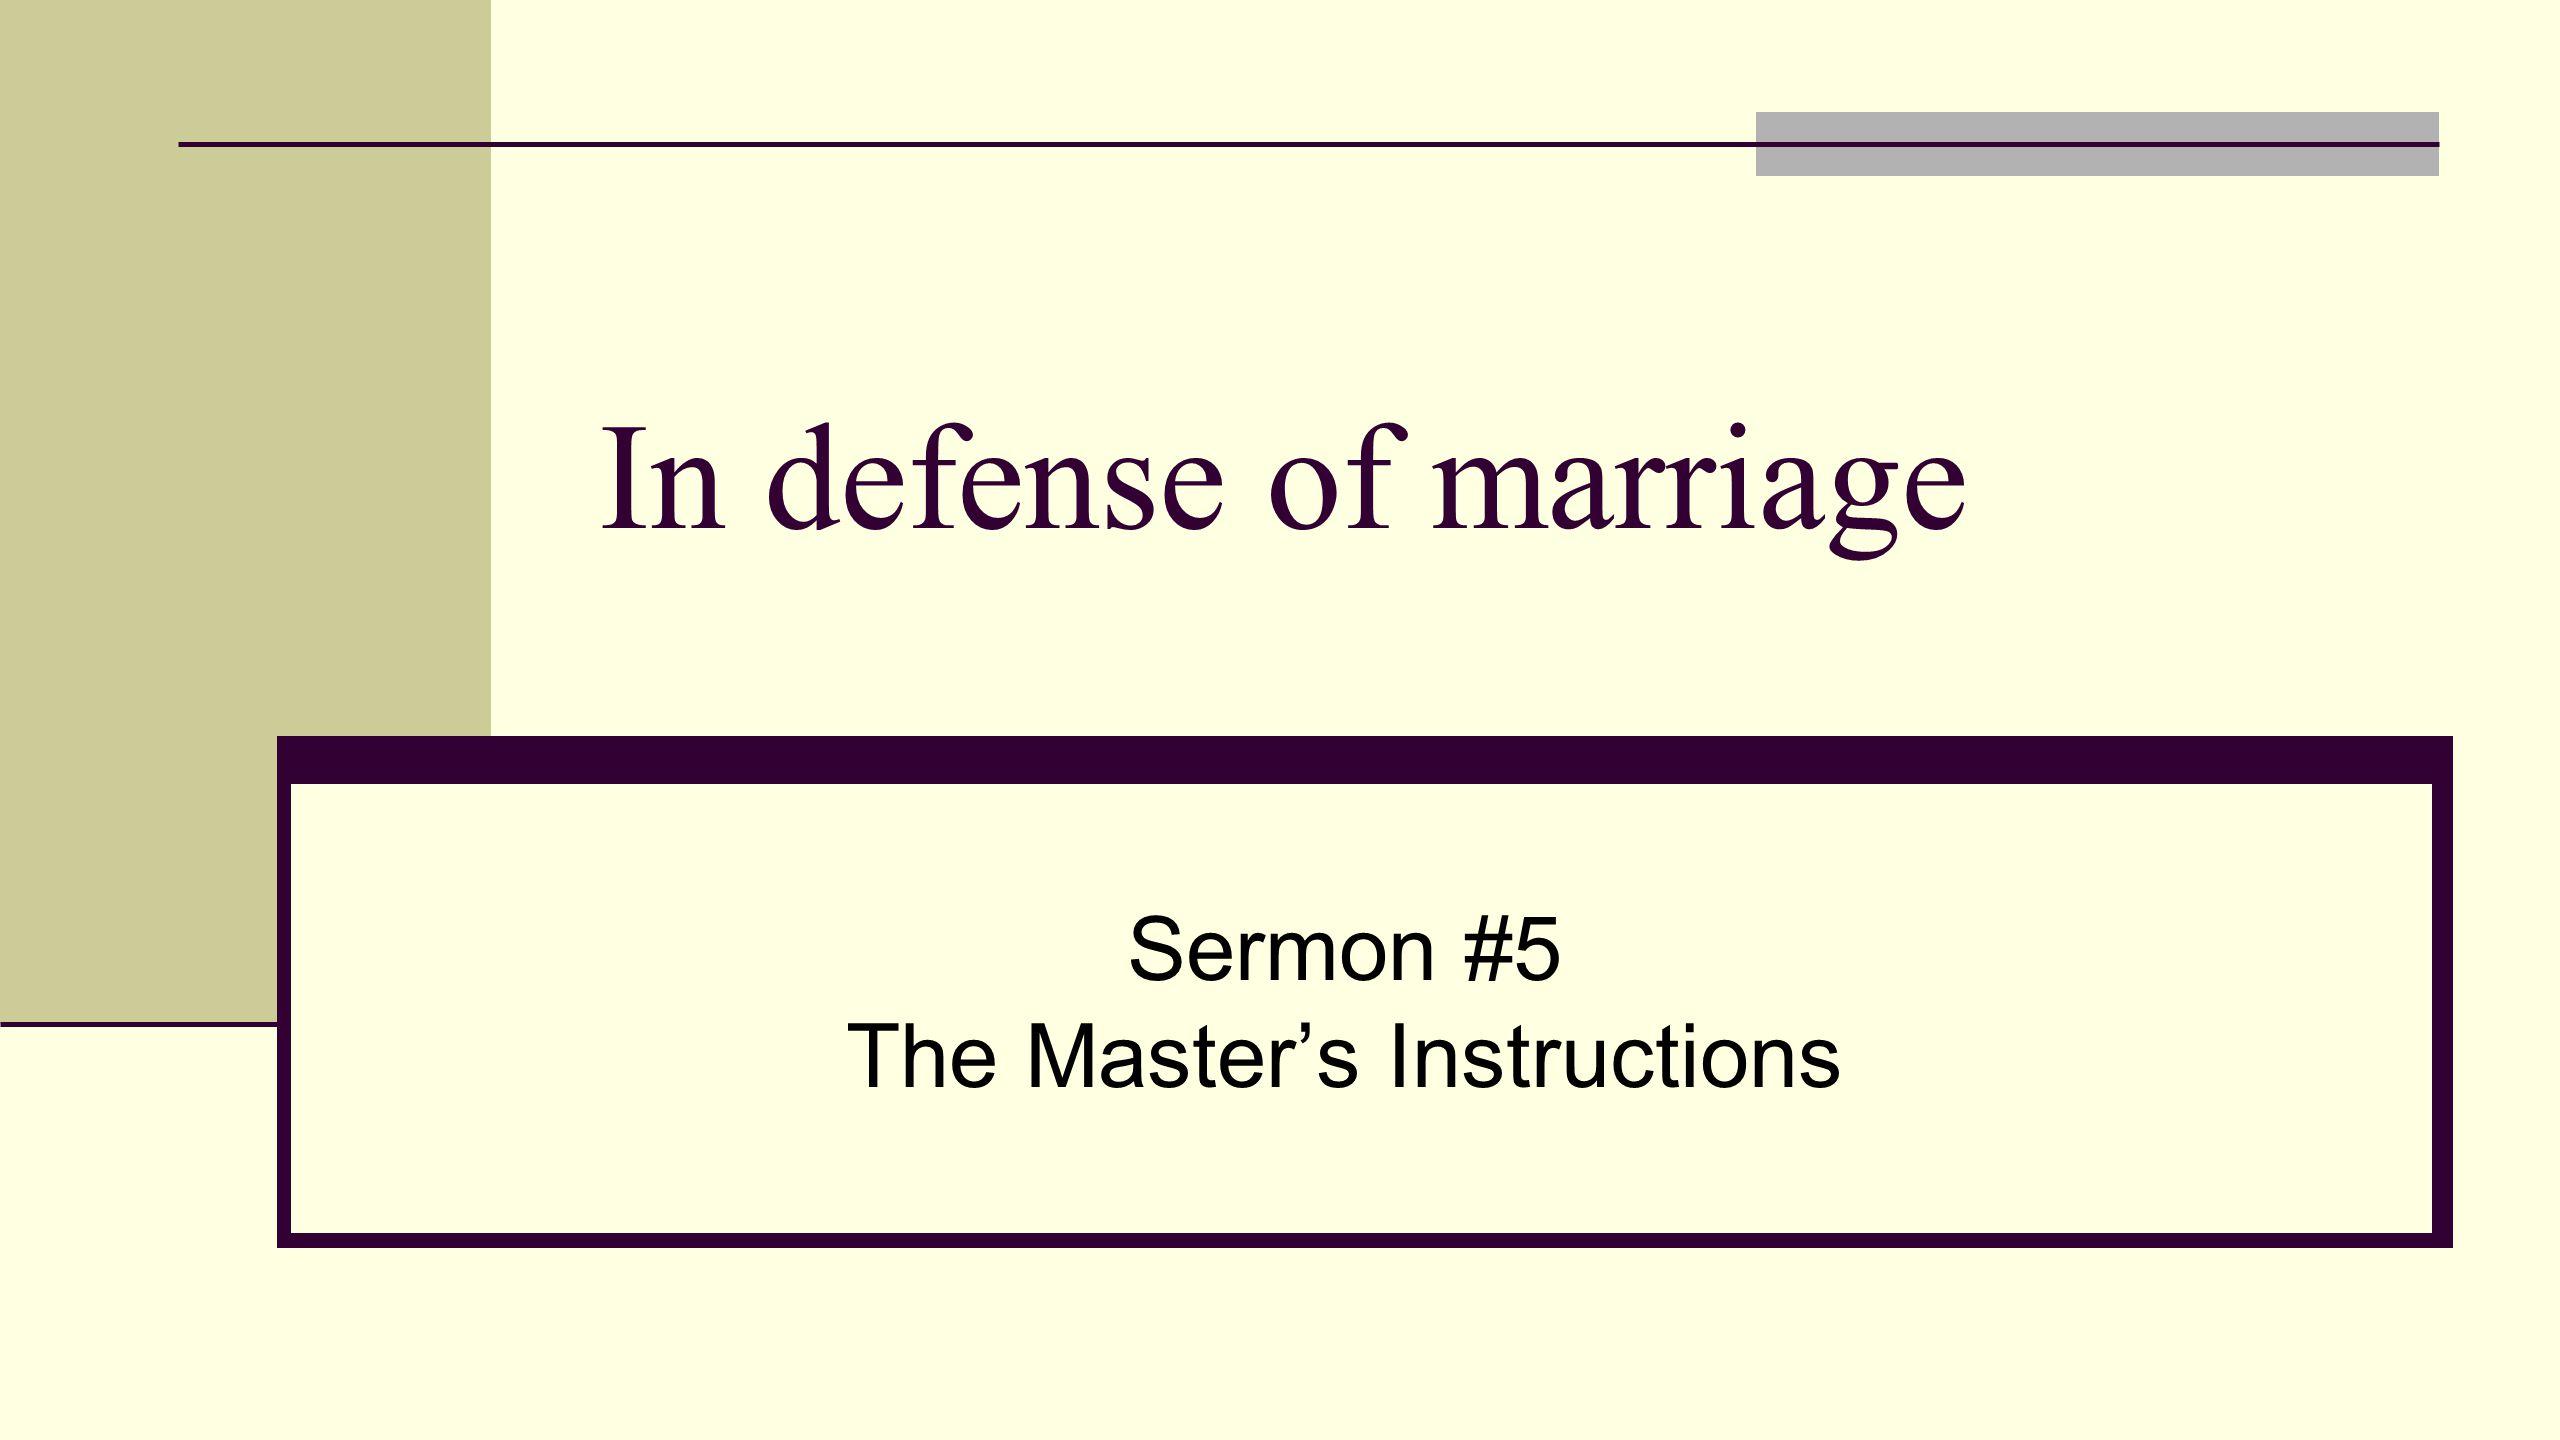 Sermon #5 The Master's Instructions